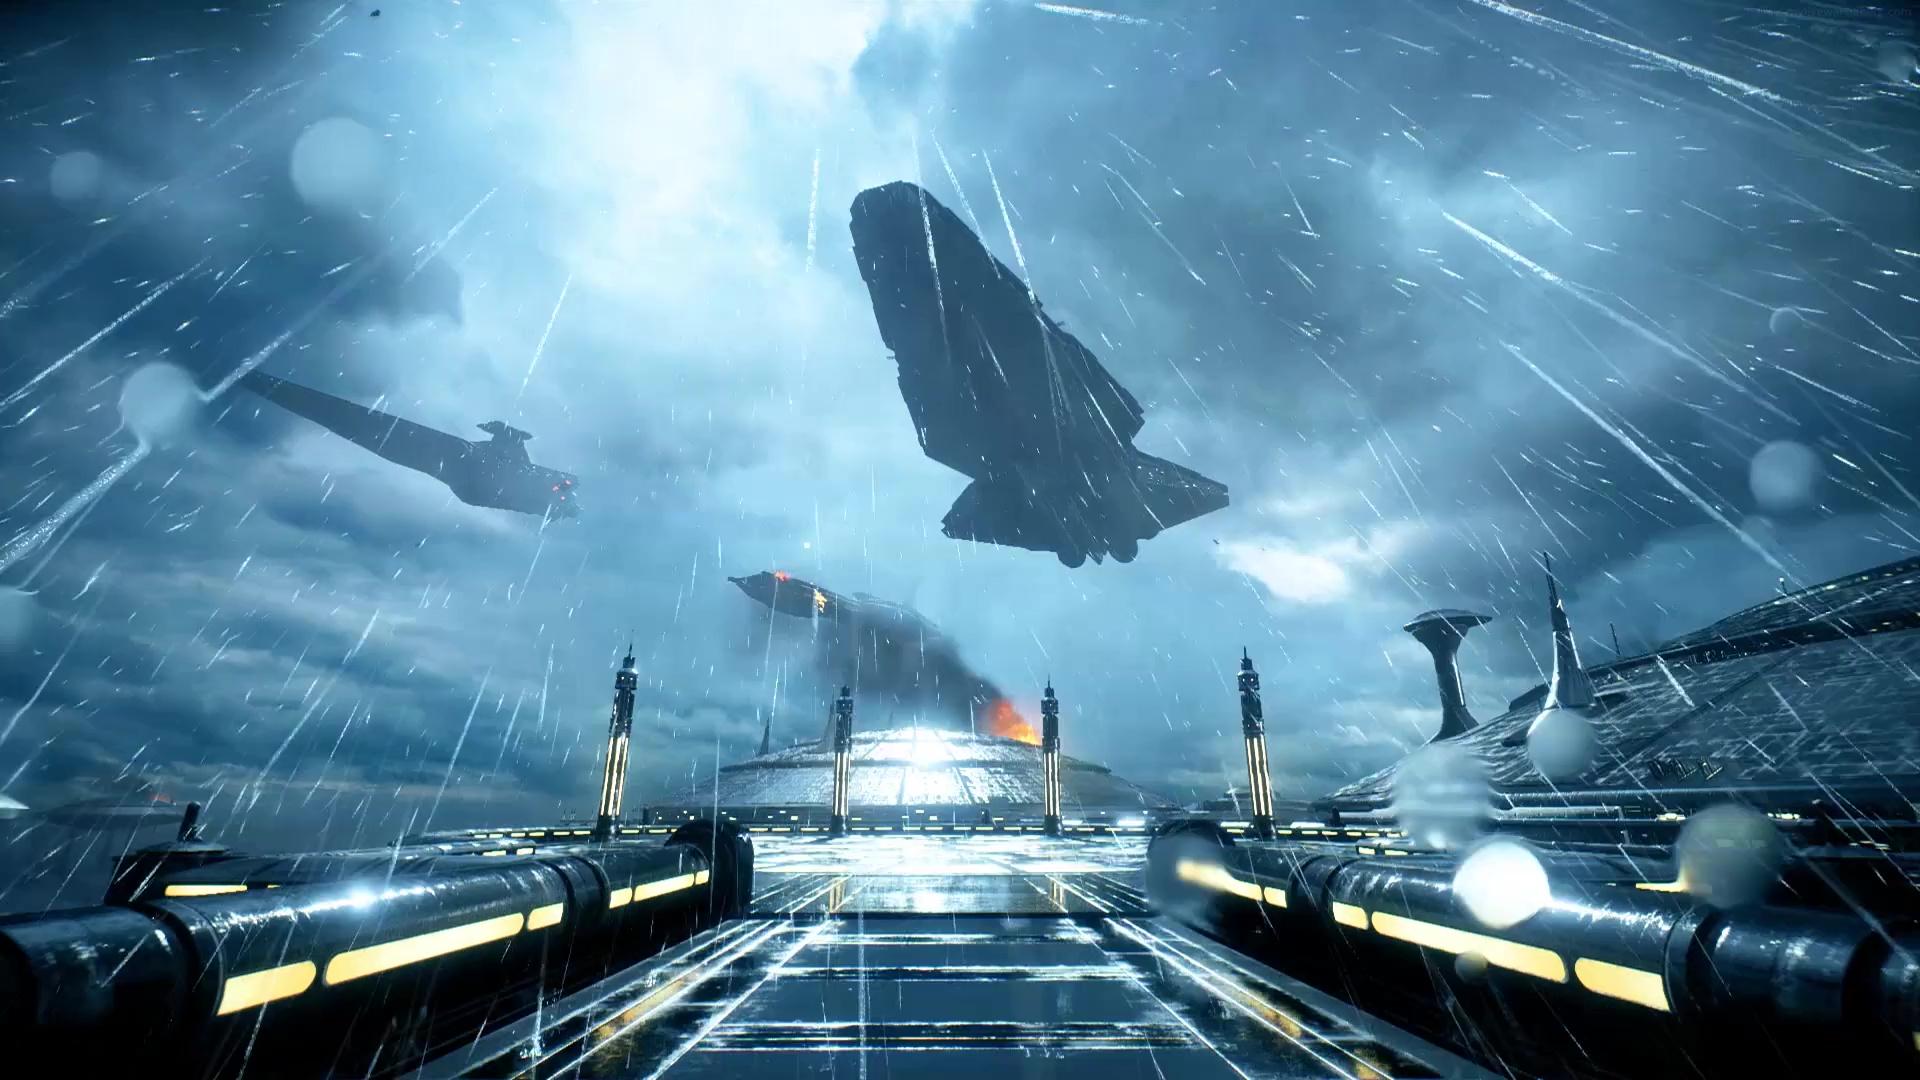 Star Wars Battlefront II: Battle Of Kamino Live Wallpaper ...